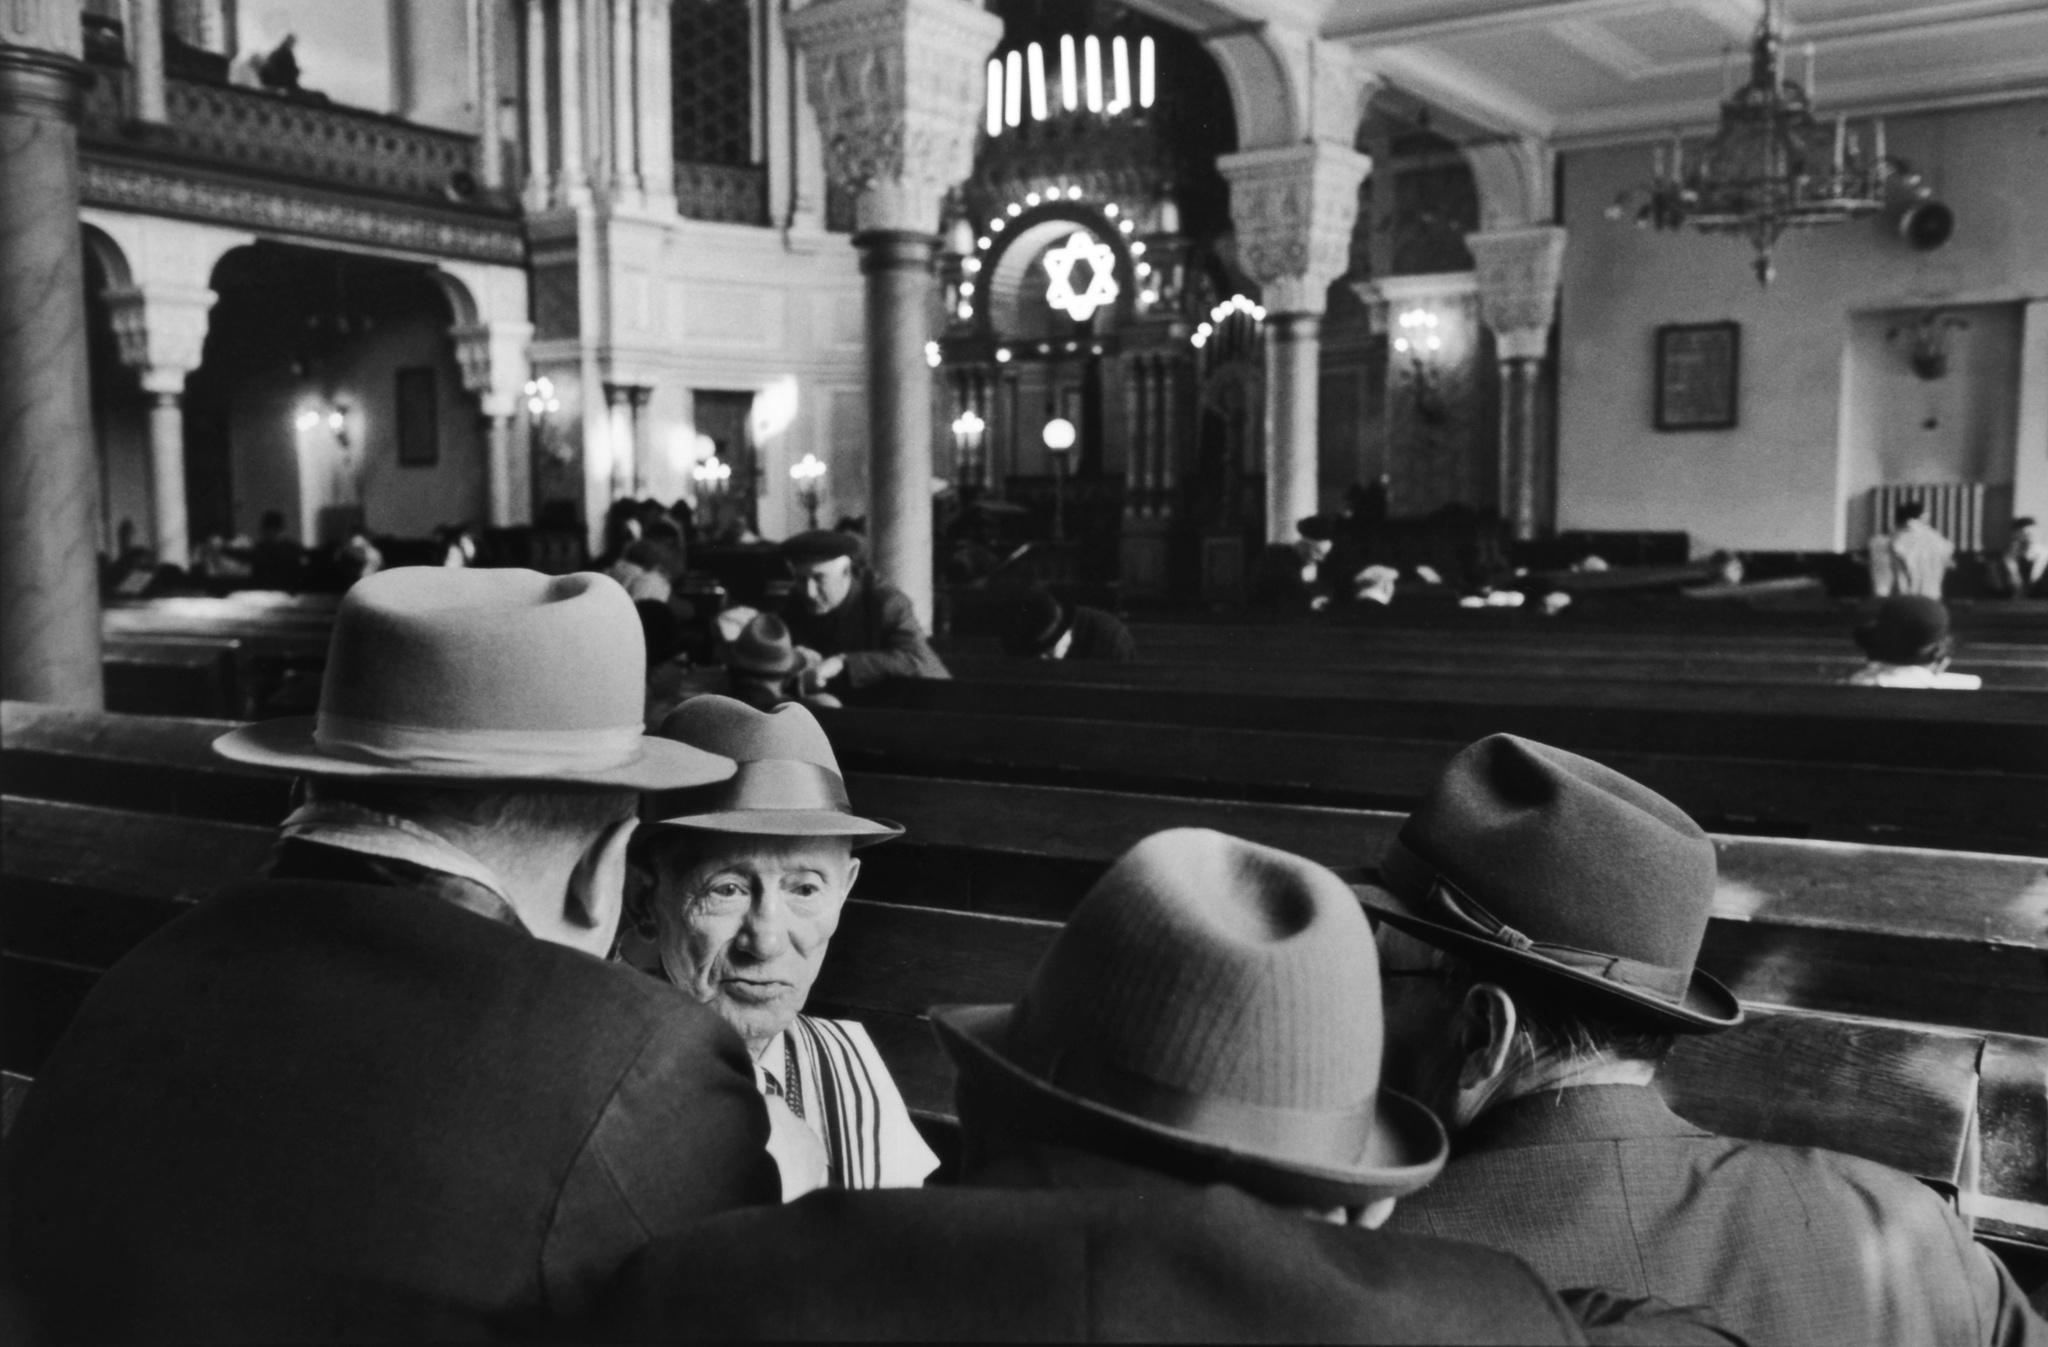 Saturday in the Synagogue, Leningrad, 1973 - Henri Cartier-Bresson